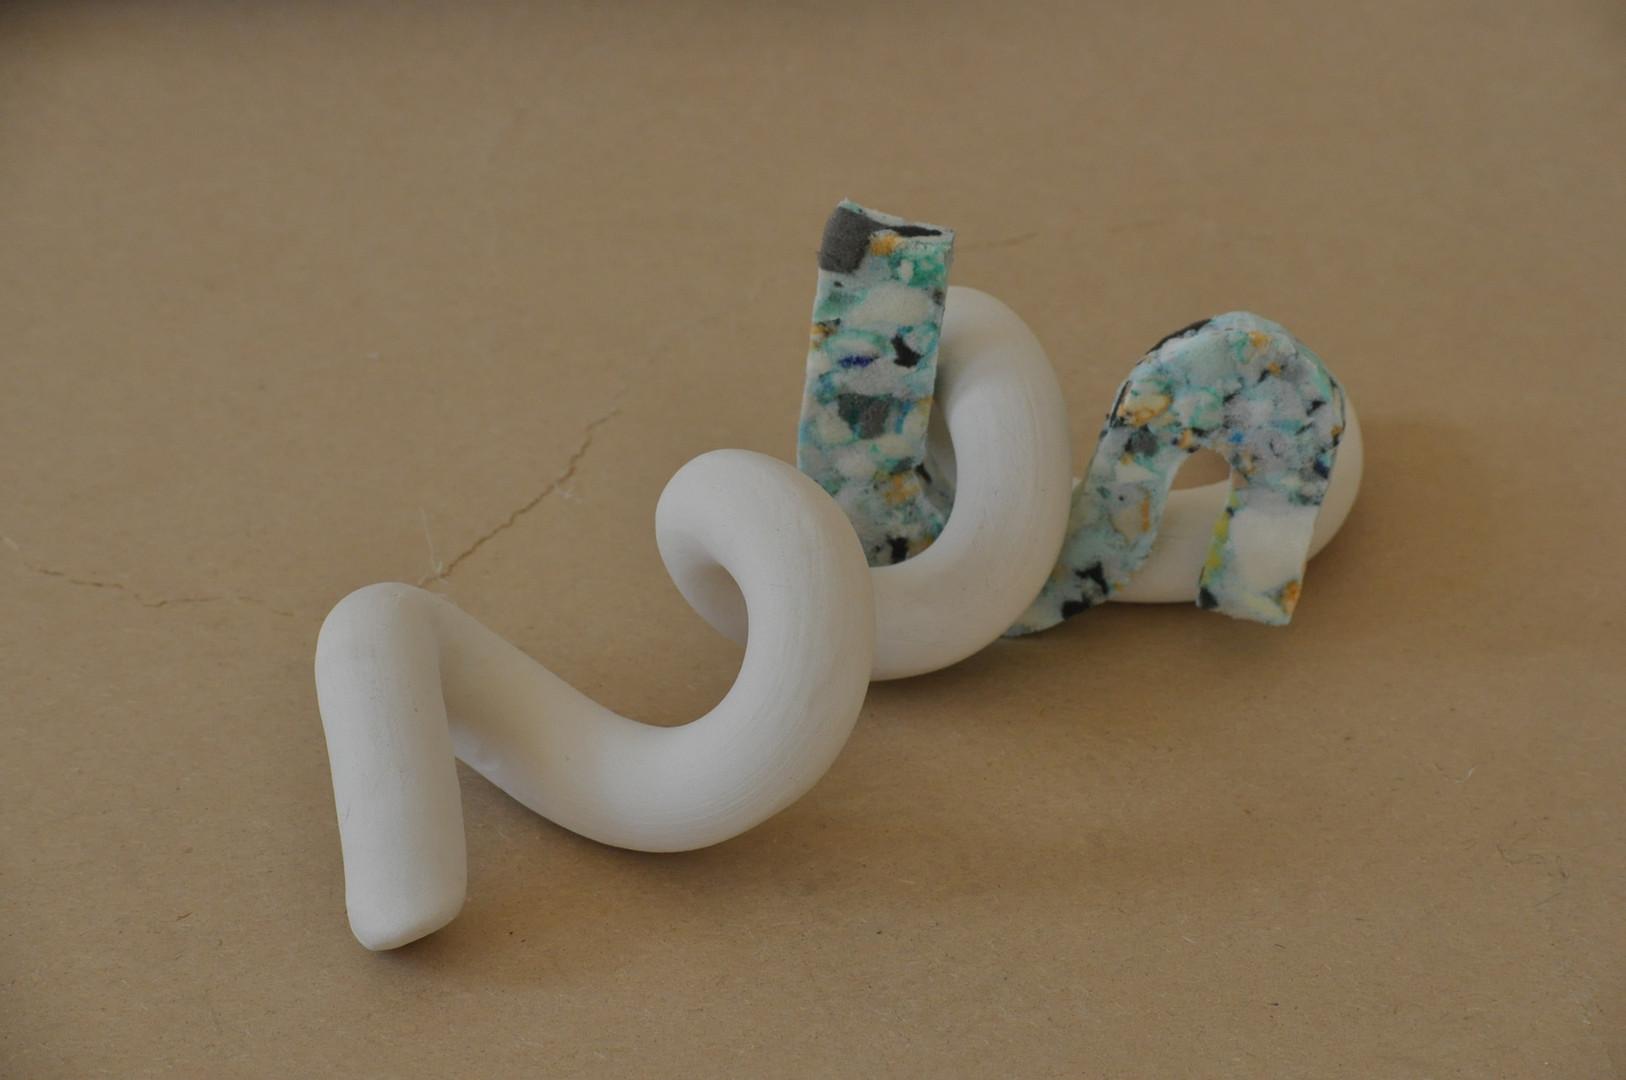 Ceramic, recycled foam